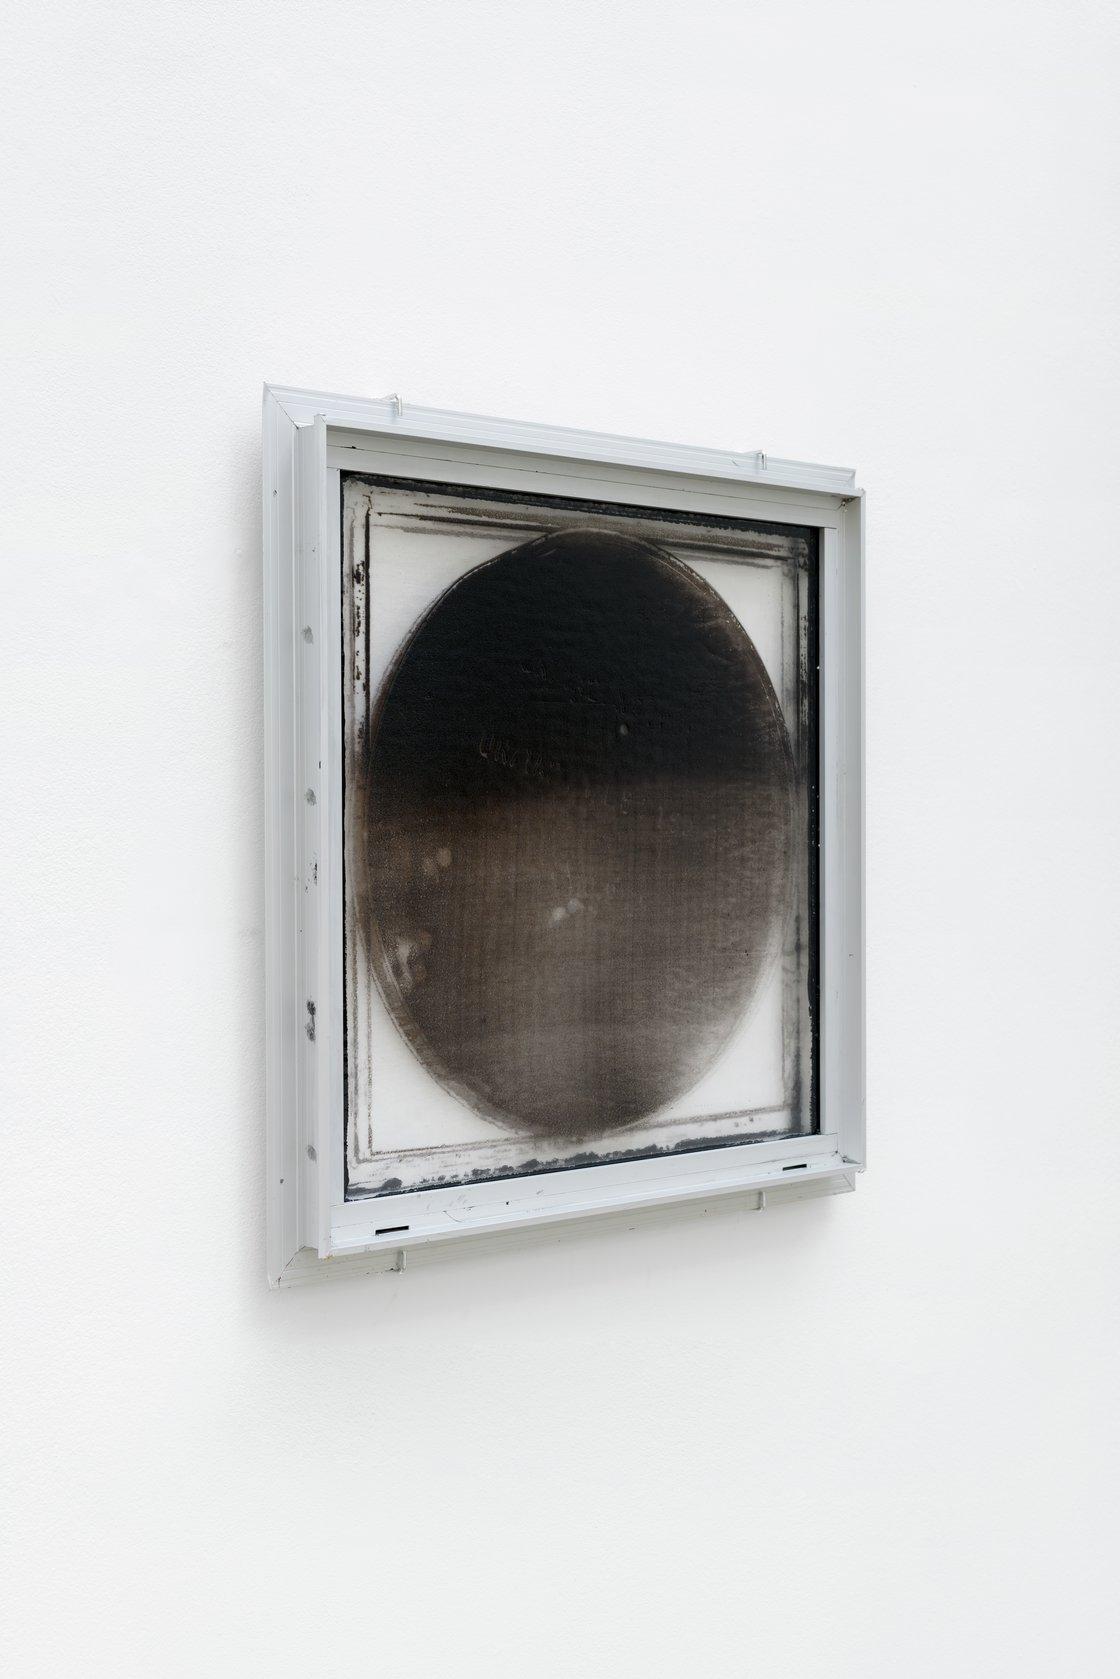 Oscar Tuazon, Sunspot, 2021